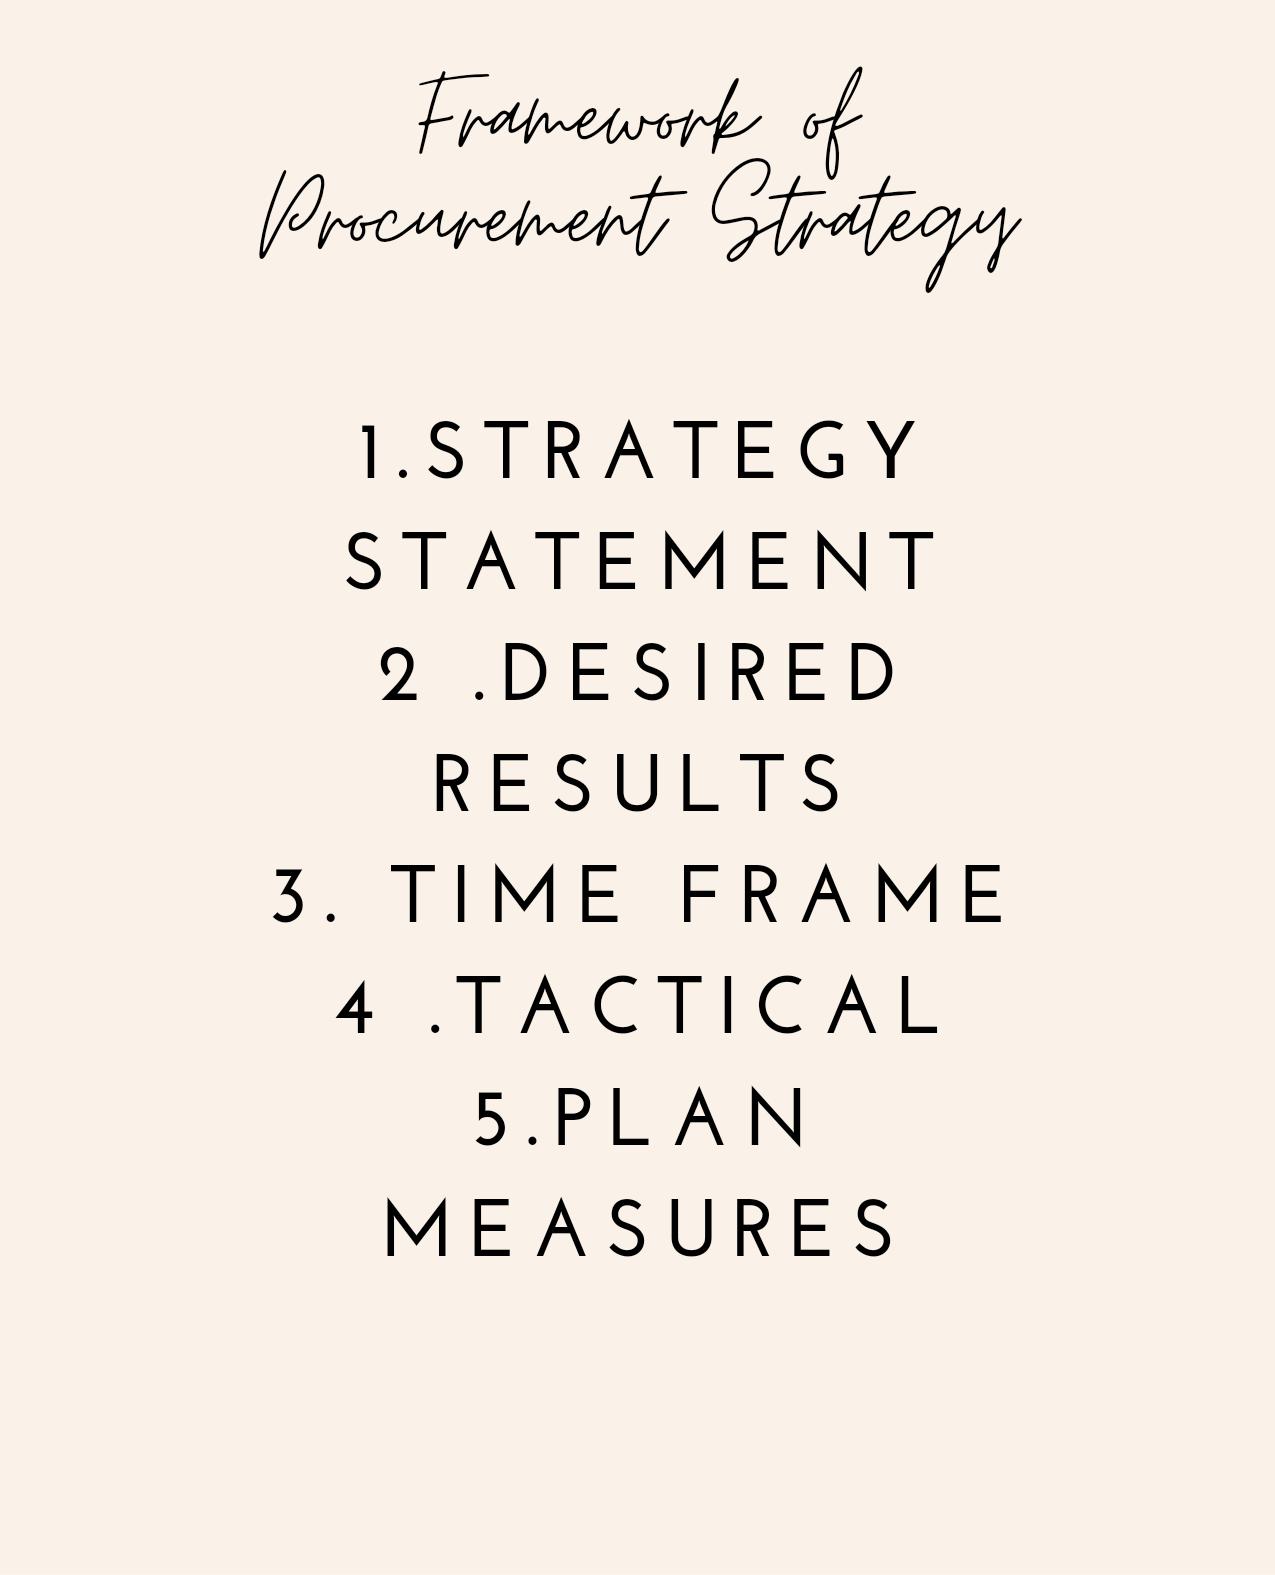 Framework of Procurement Strategy